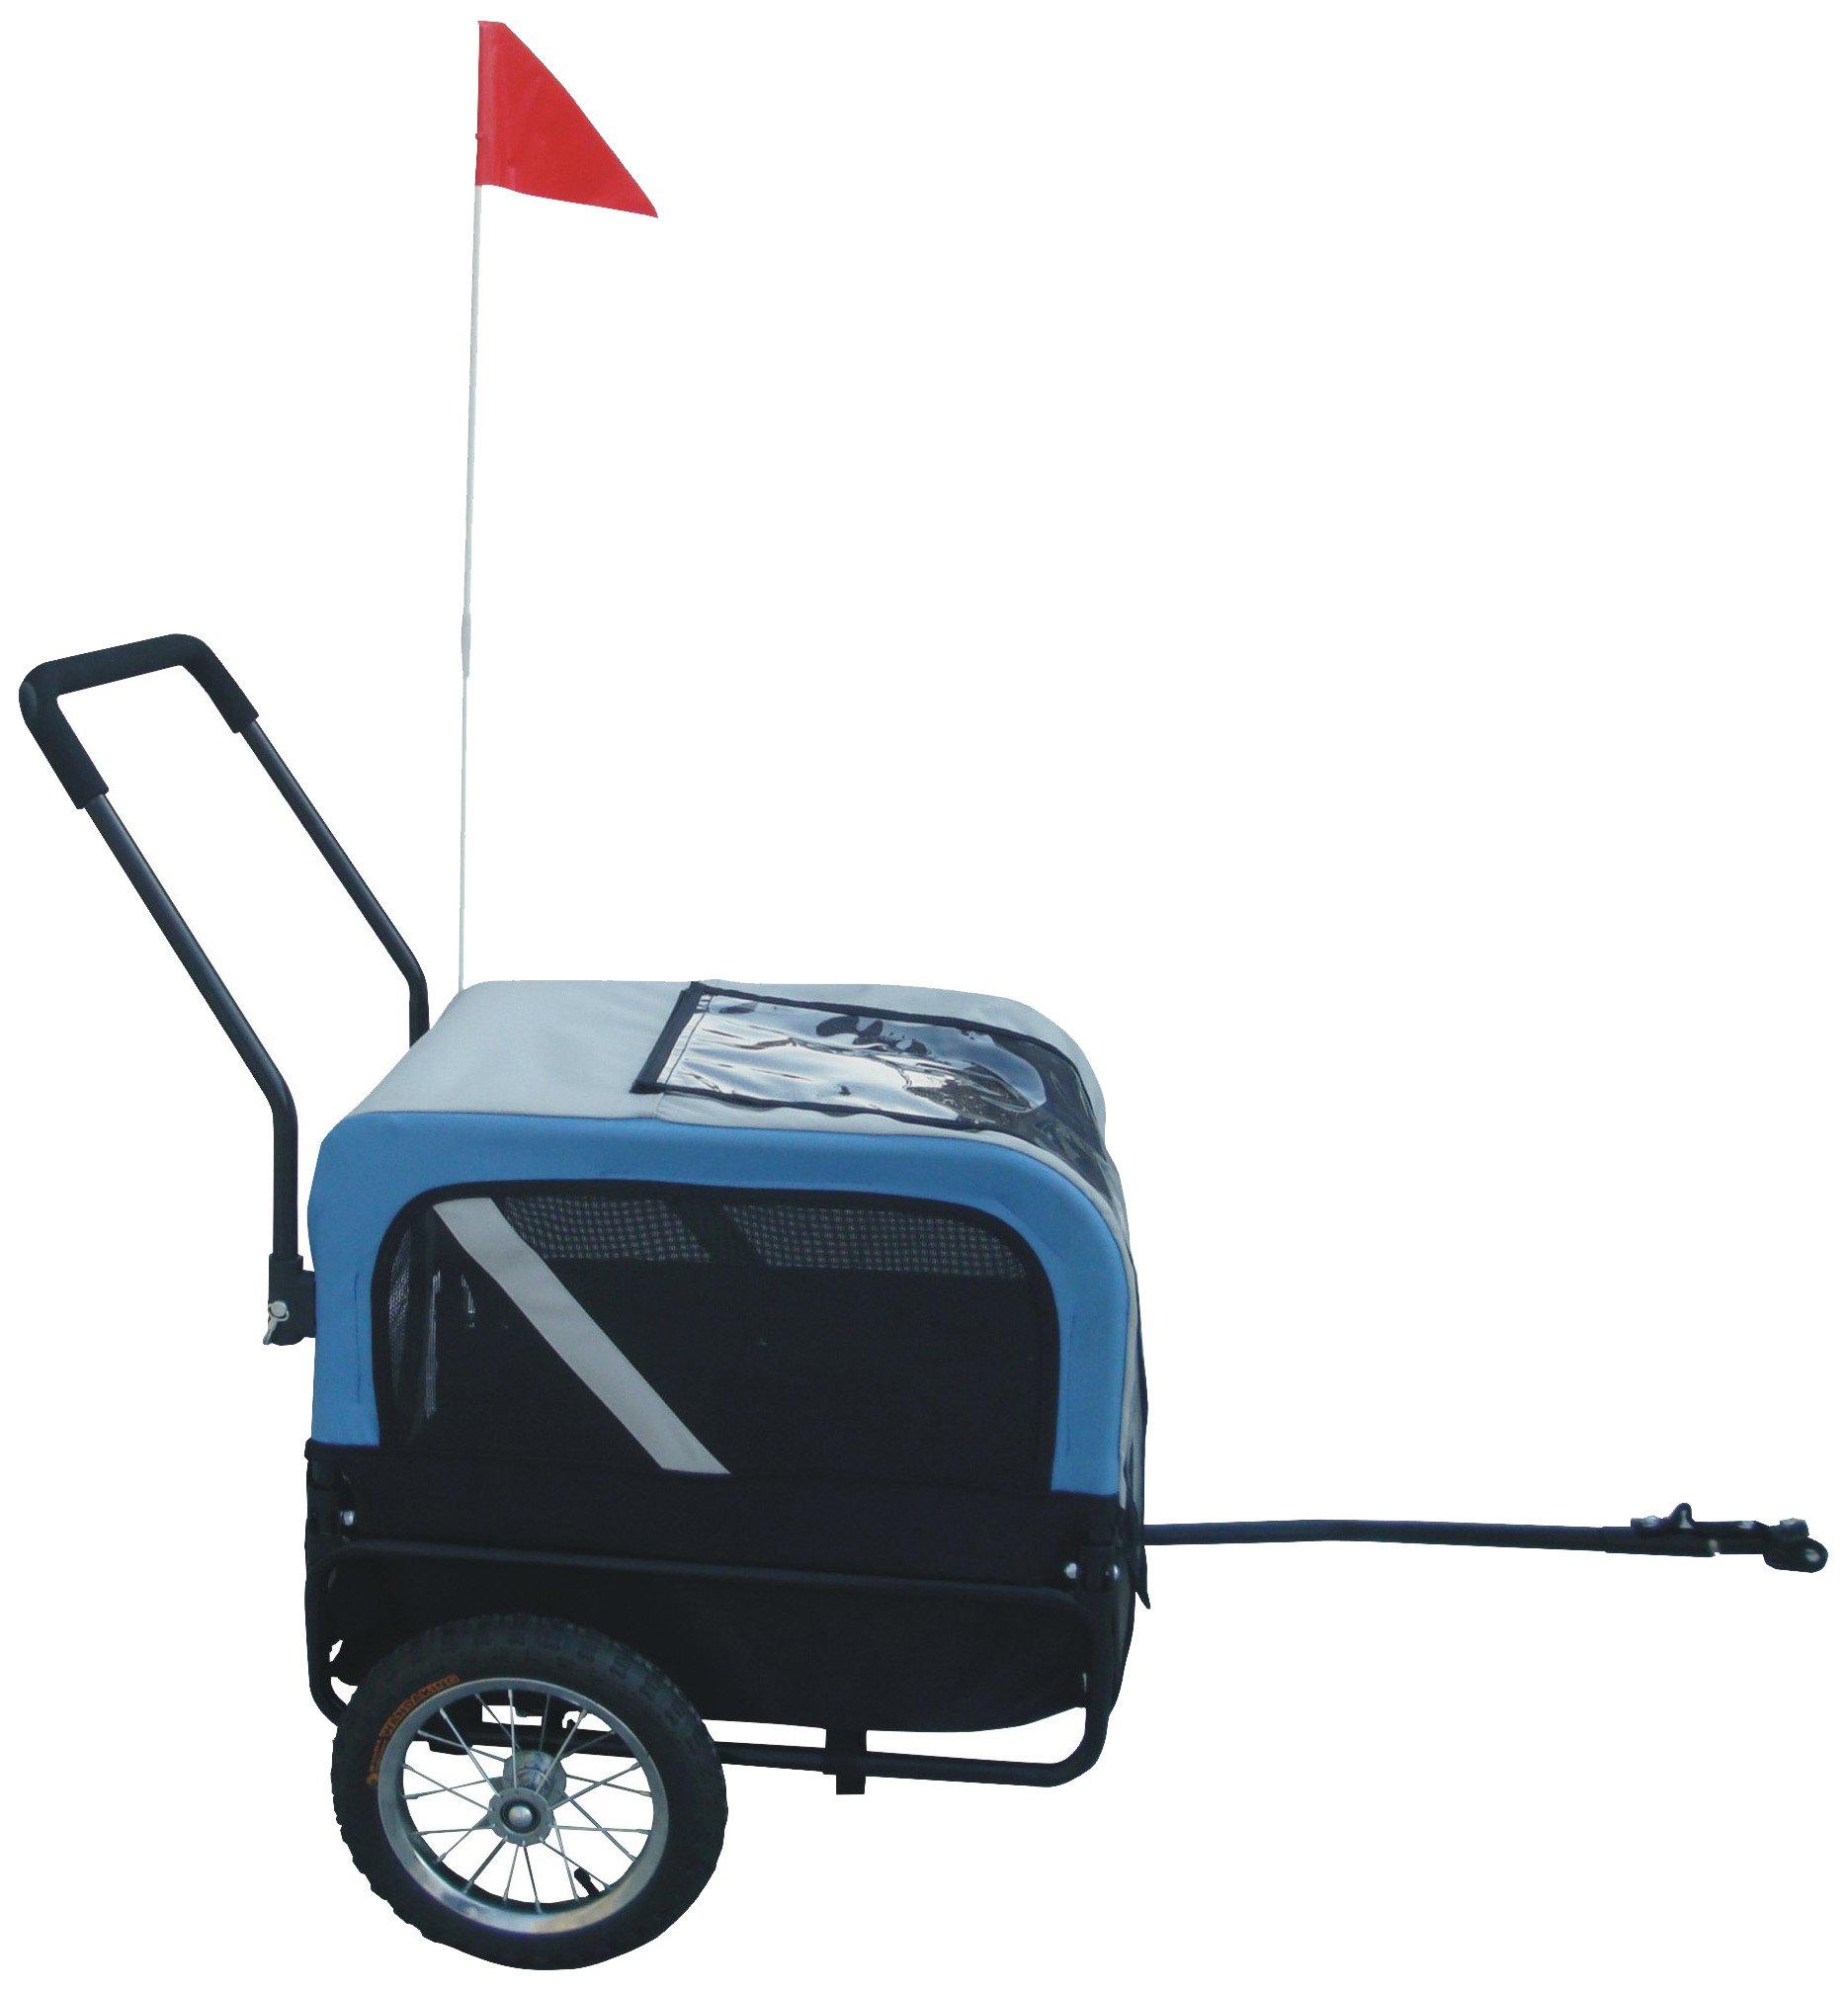 MDOG2 MK1484 Comfy Pet Bike Trailer/Jogging Stroller, Small, Blue/Grey